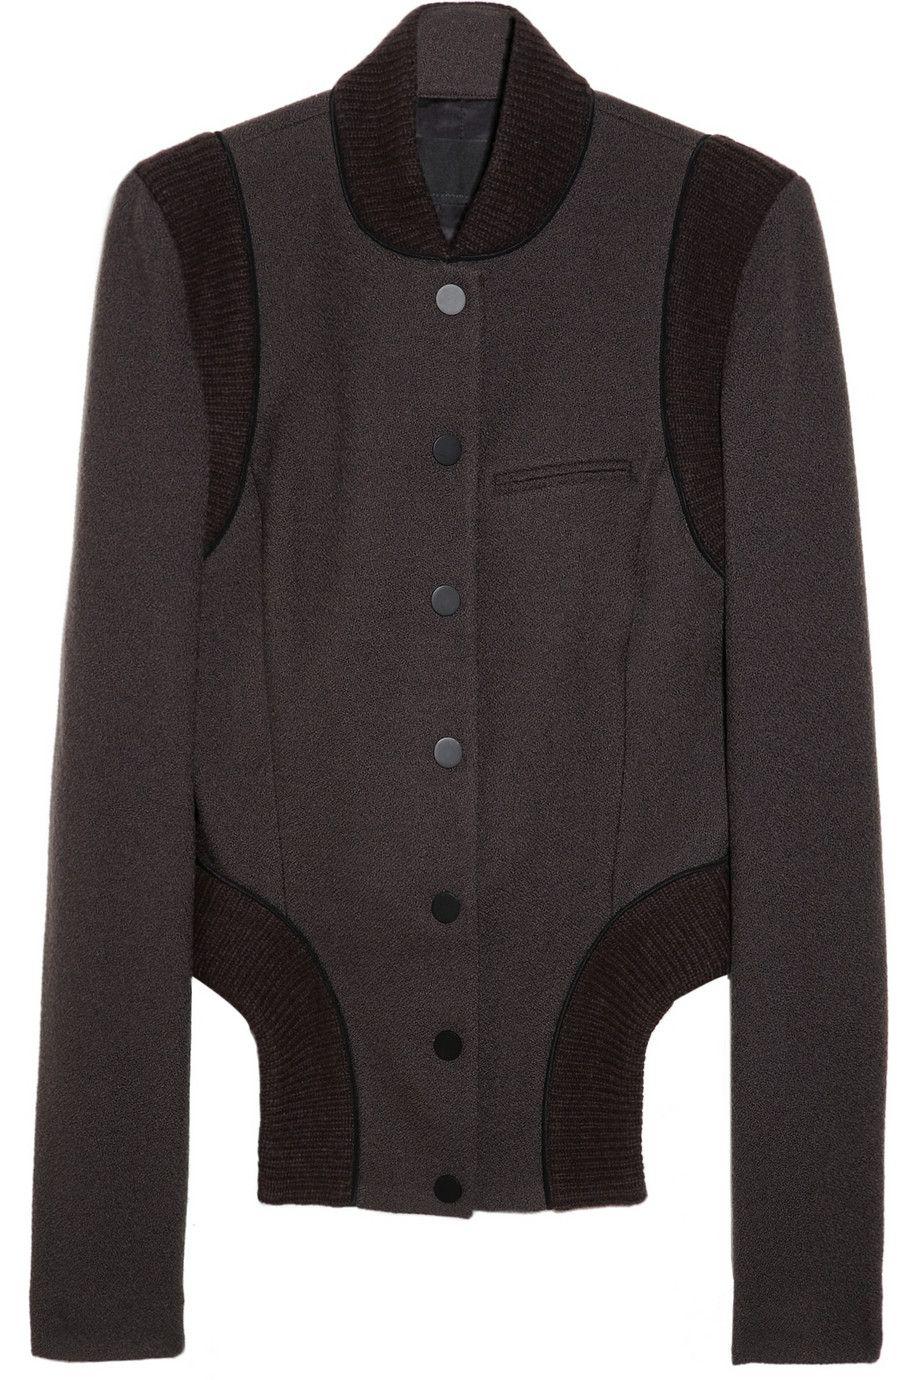 Dippedfront wooljersey varsity jacket by alexander wang